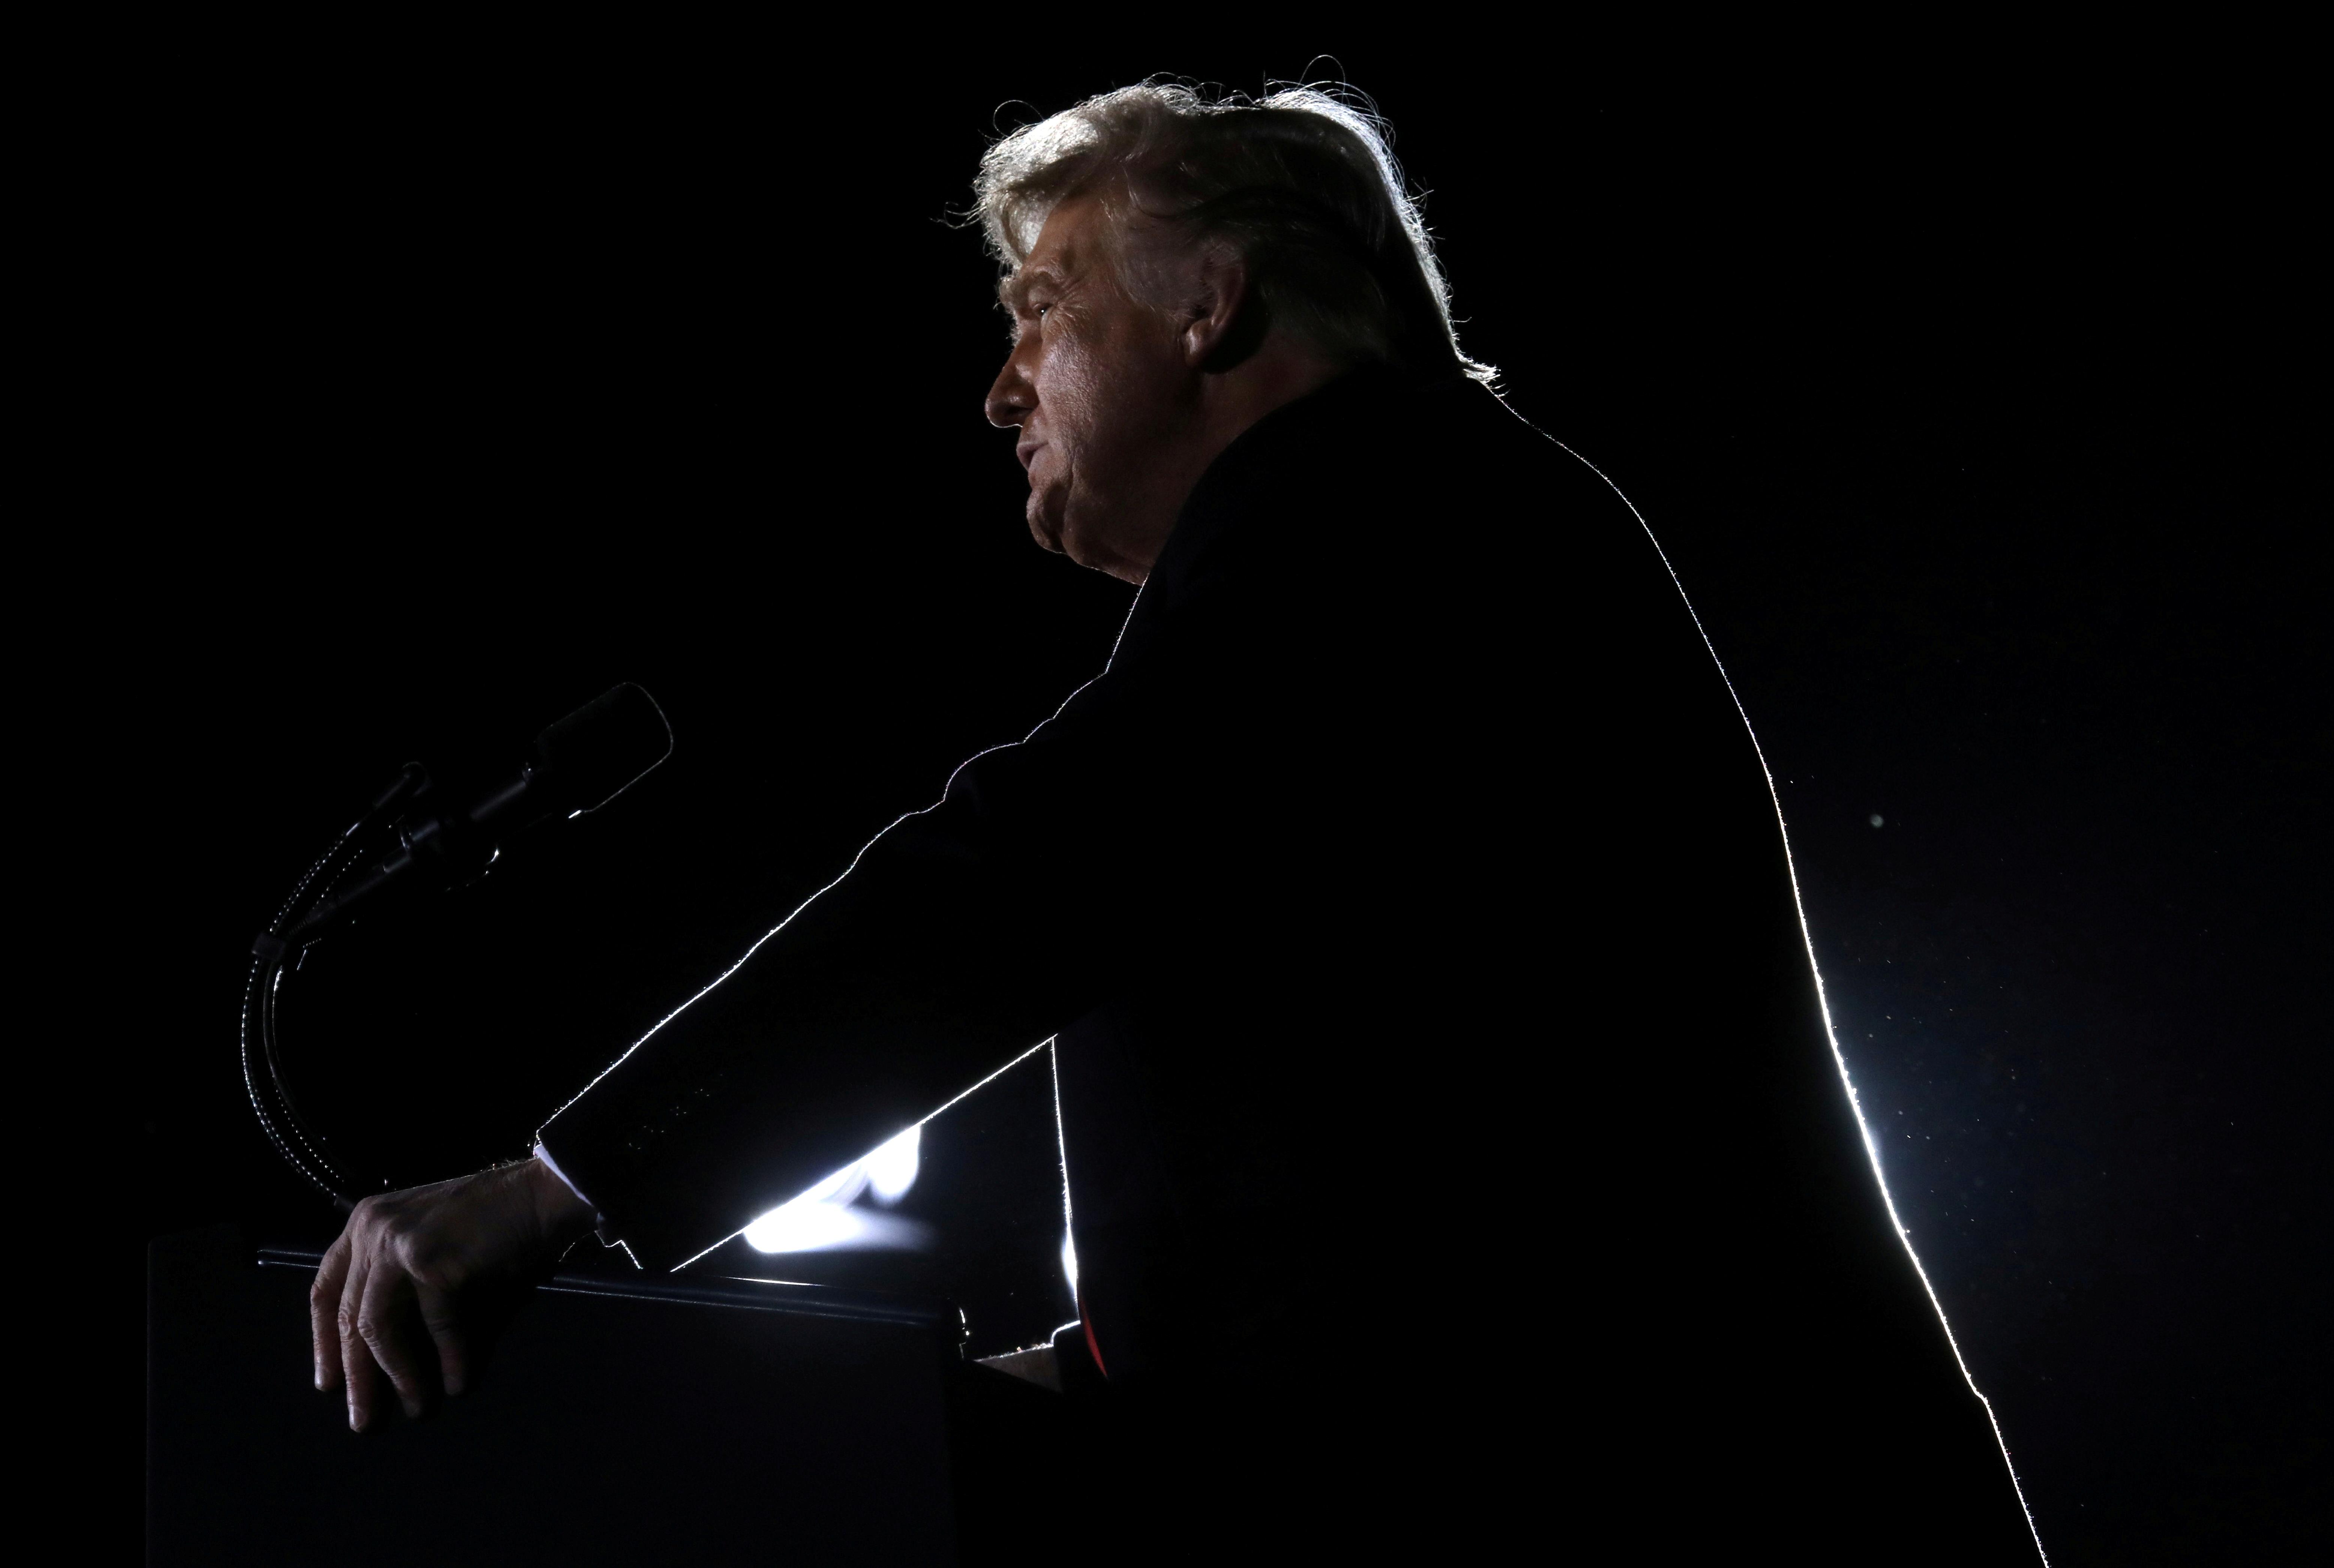 U.S. President Donald Trump addresses a campaign rally in Dalton, Georgia, U.S., on the eve of the run-off election to decide both of Georgia